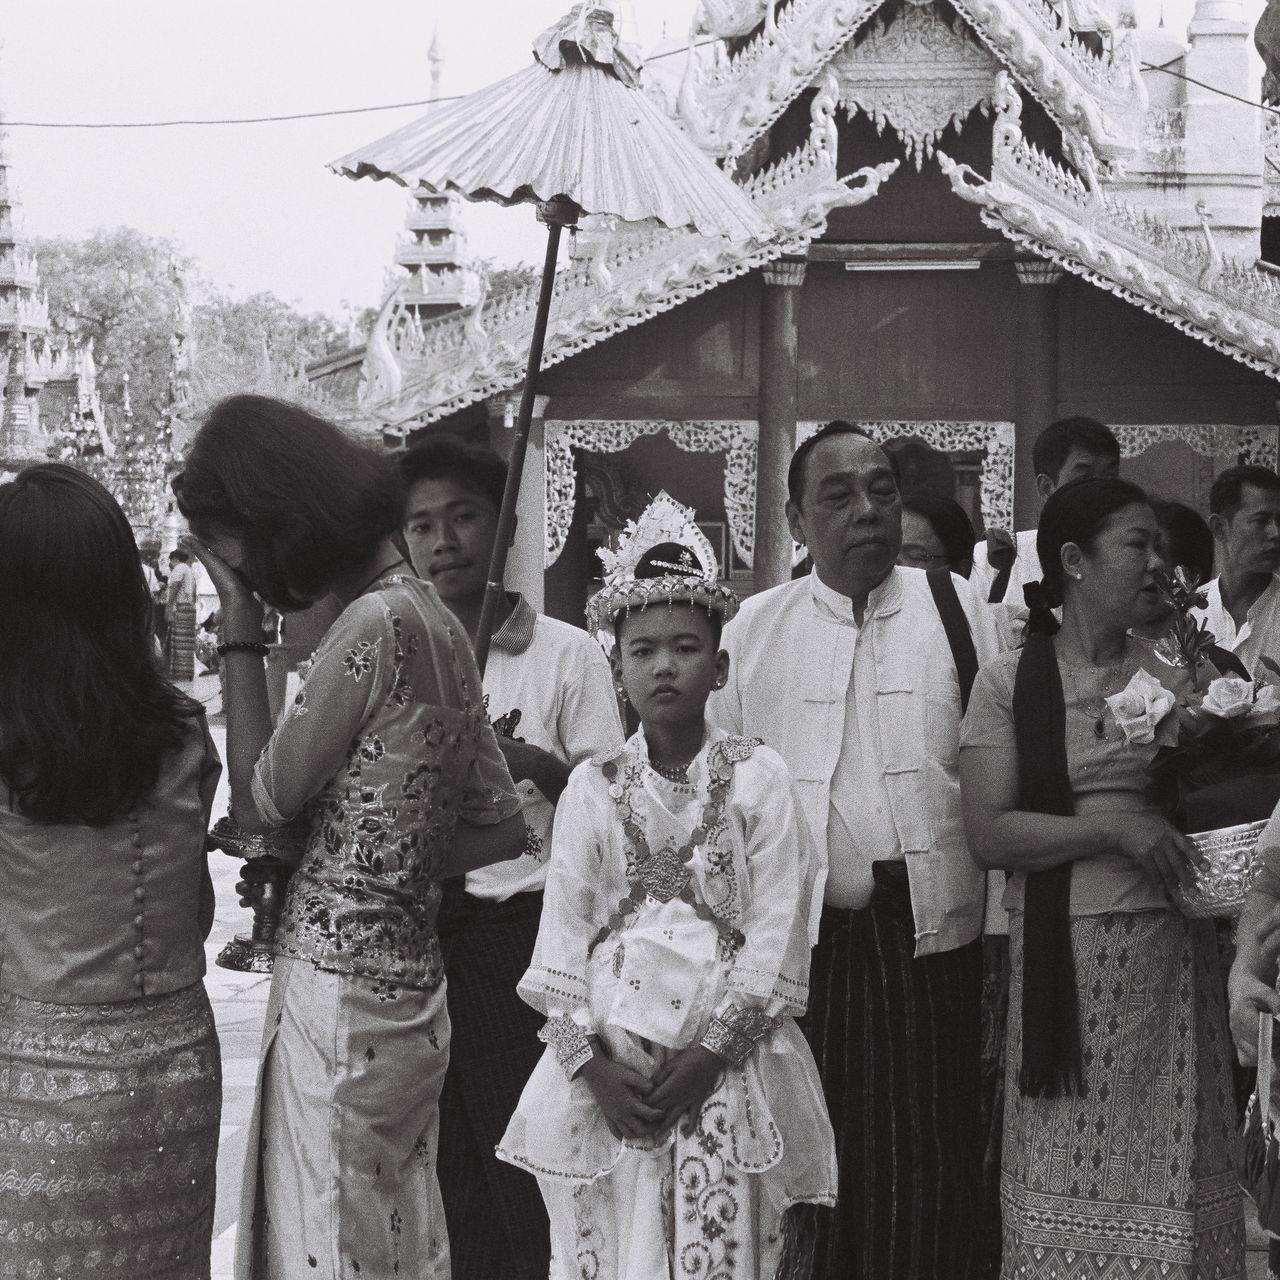 Ordination ceremonyThe Photojournalist - 2017 EyeEm Awards Real PeopleIusefilm Ishootfilm 35mm Ilfordpan400 Myanmar Arts Culture And Entertainment Buddha Buddhism Spirituality The Street Photographer - 2017 EyeEm Awards